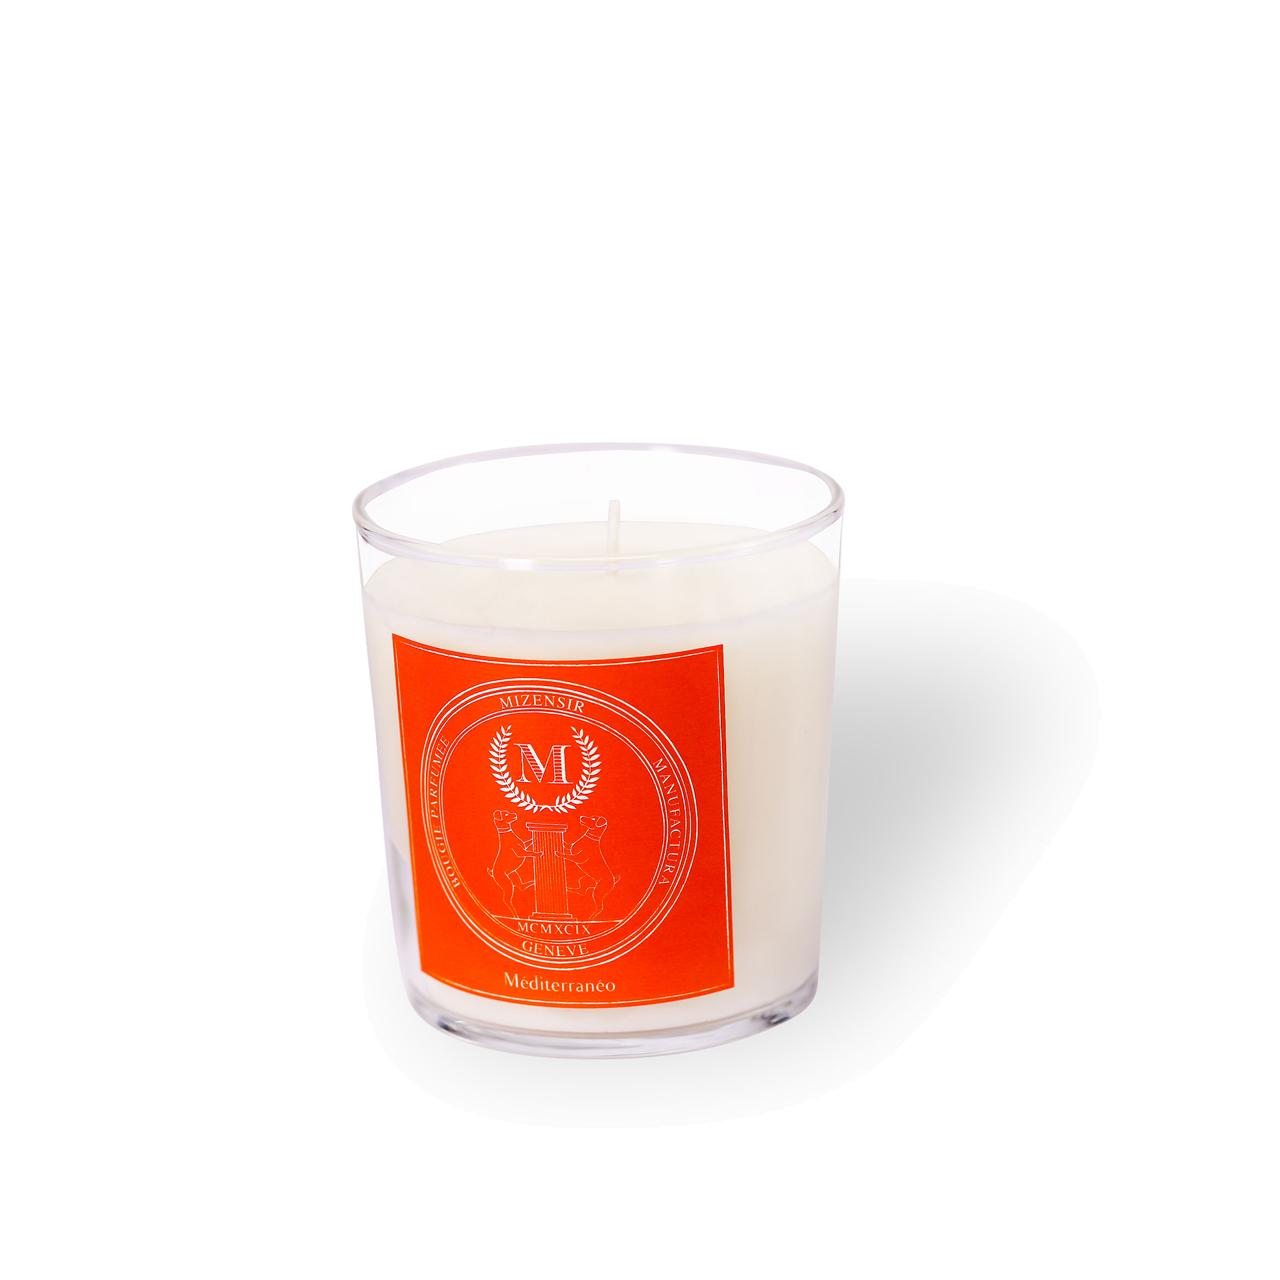 Mediterraneo - Candle